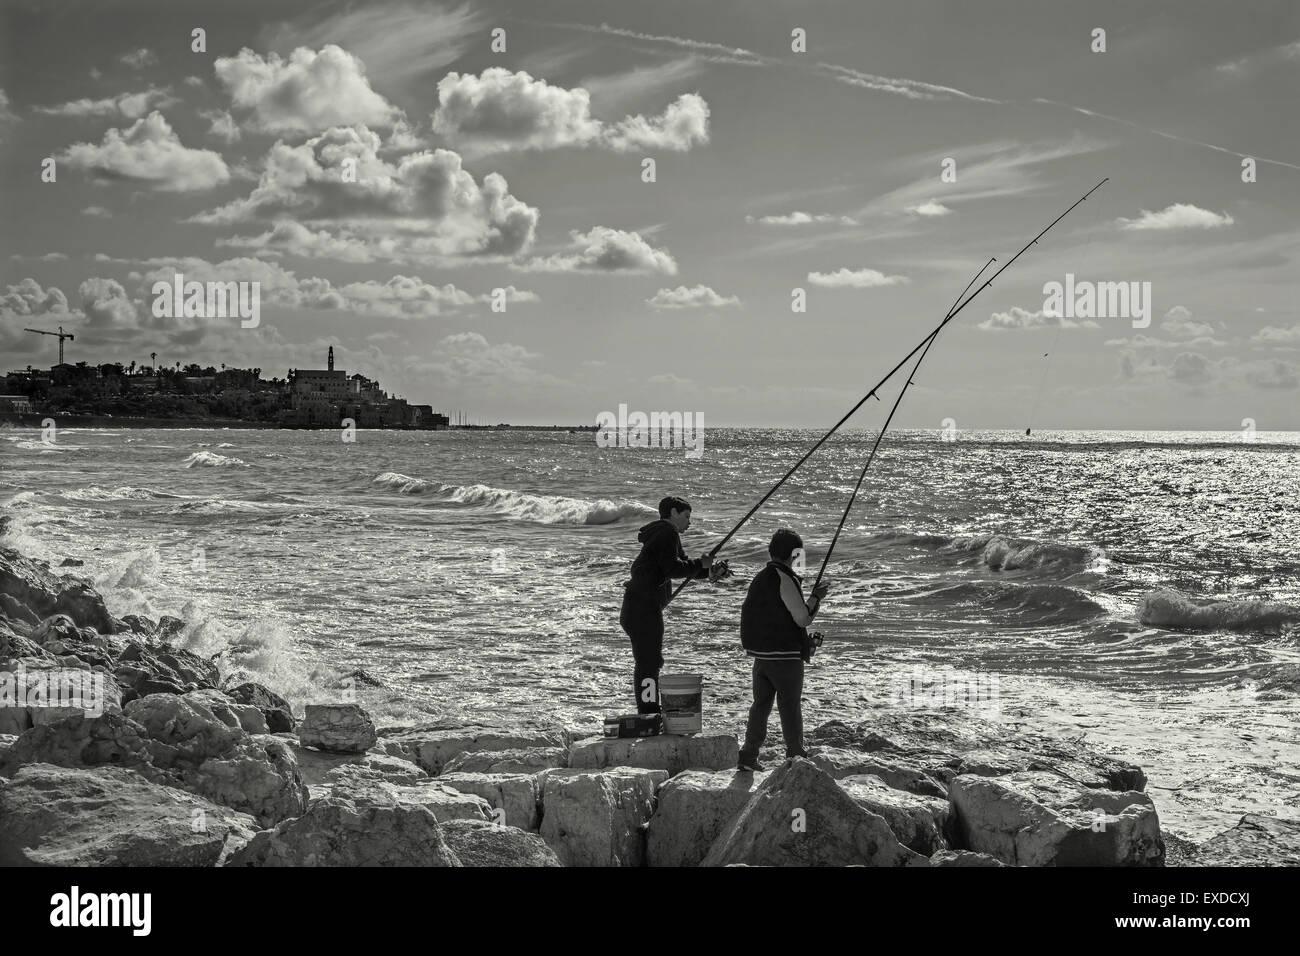 TEL AVIV, ISRAEL - MARCH 2, 2015: The fishing of boys on the seaside in Tel Aviv - Stock Image